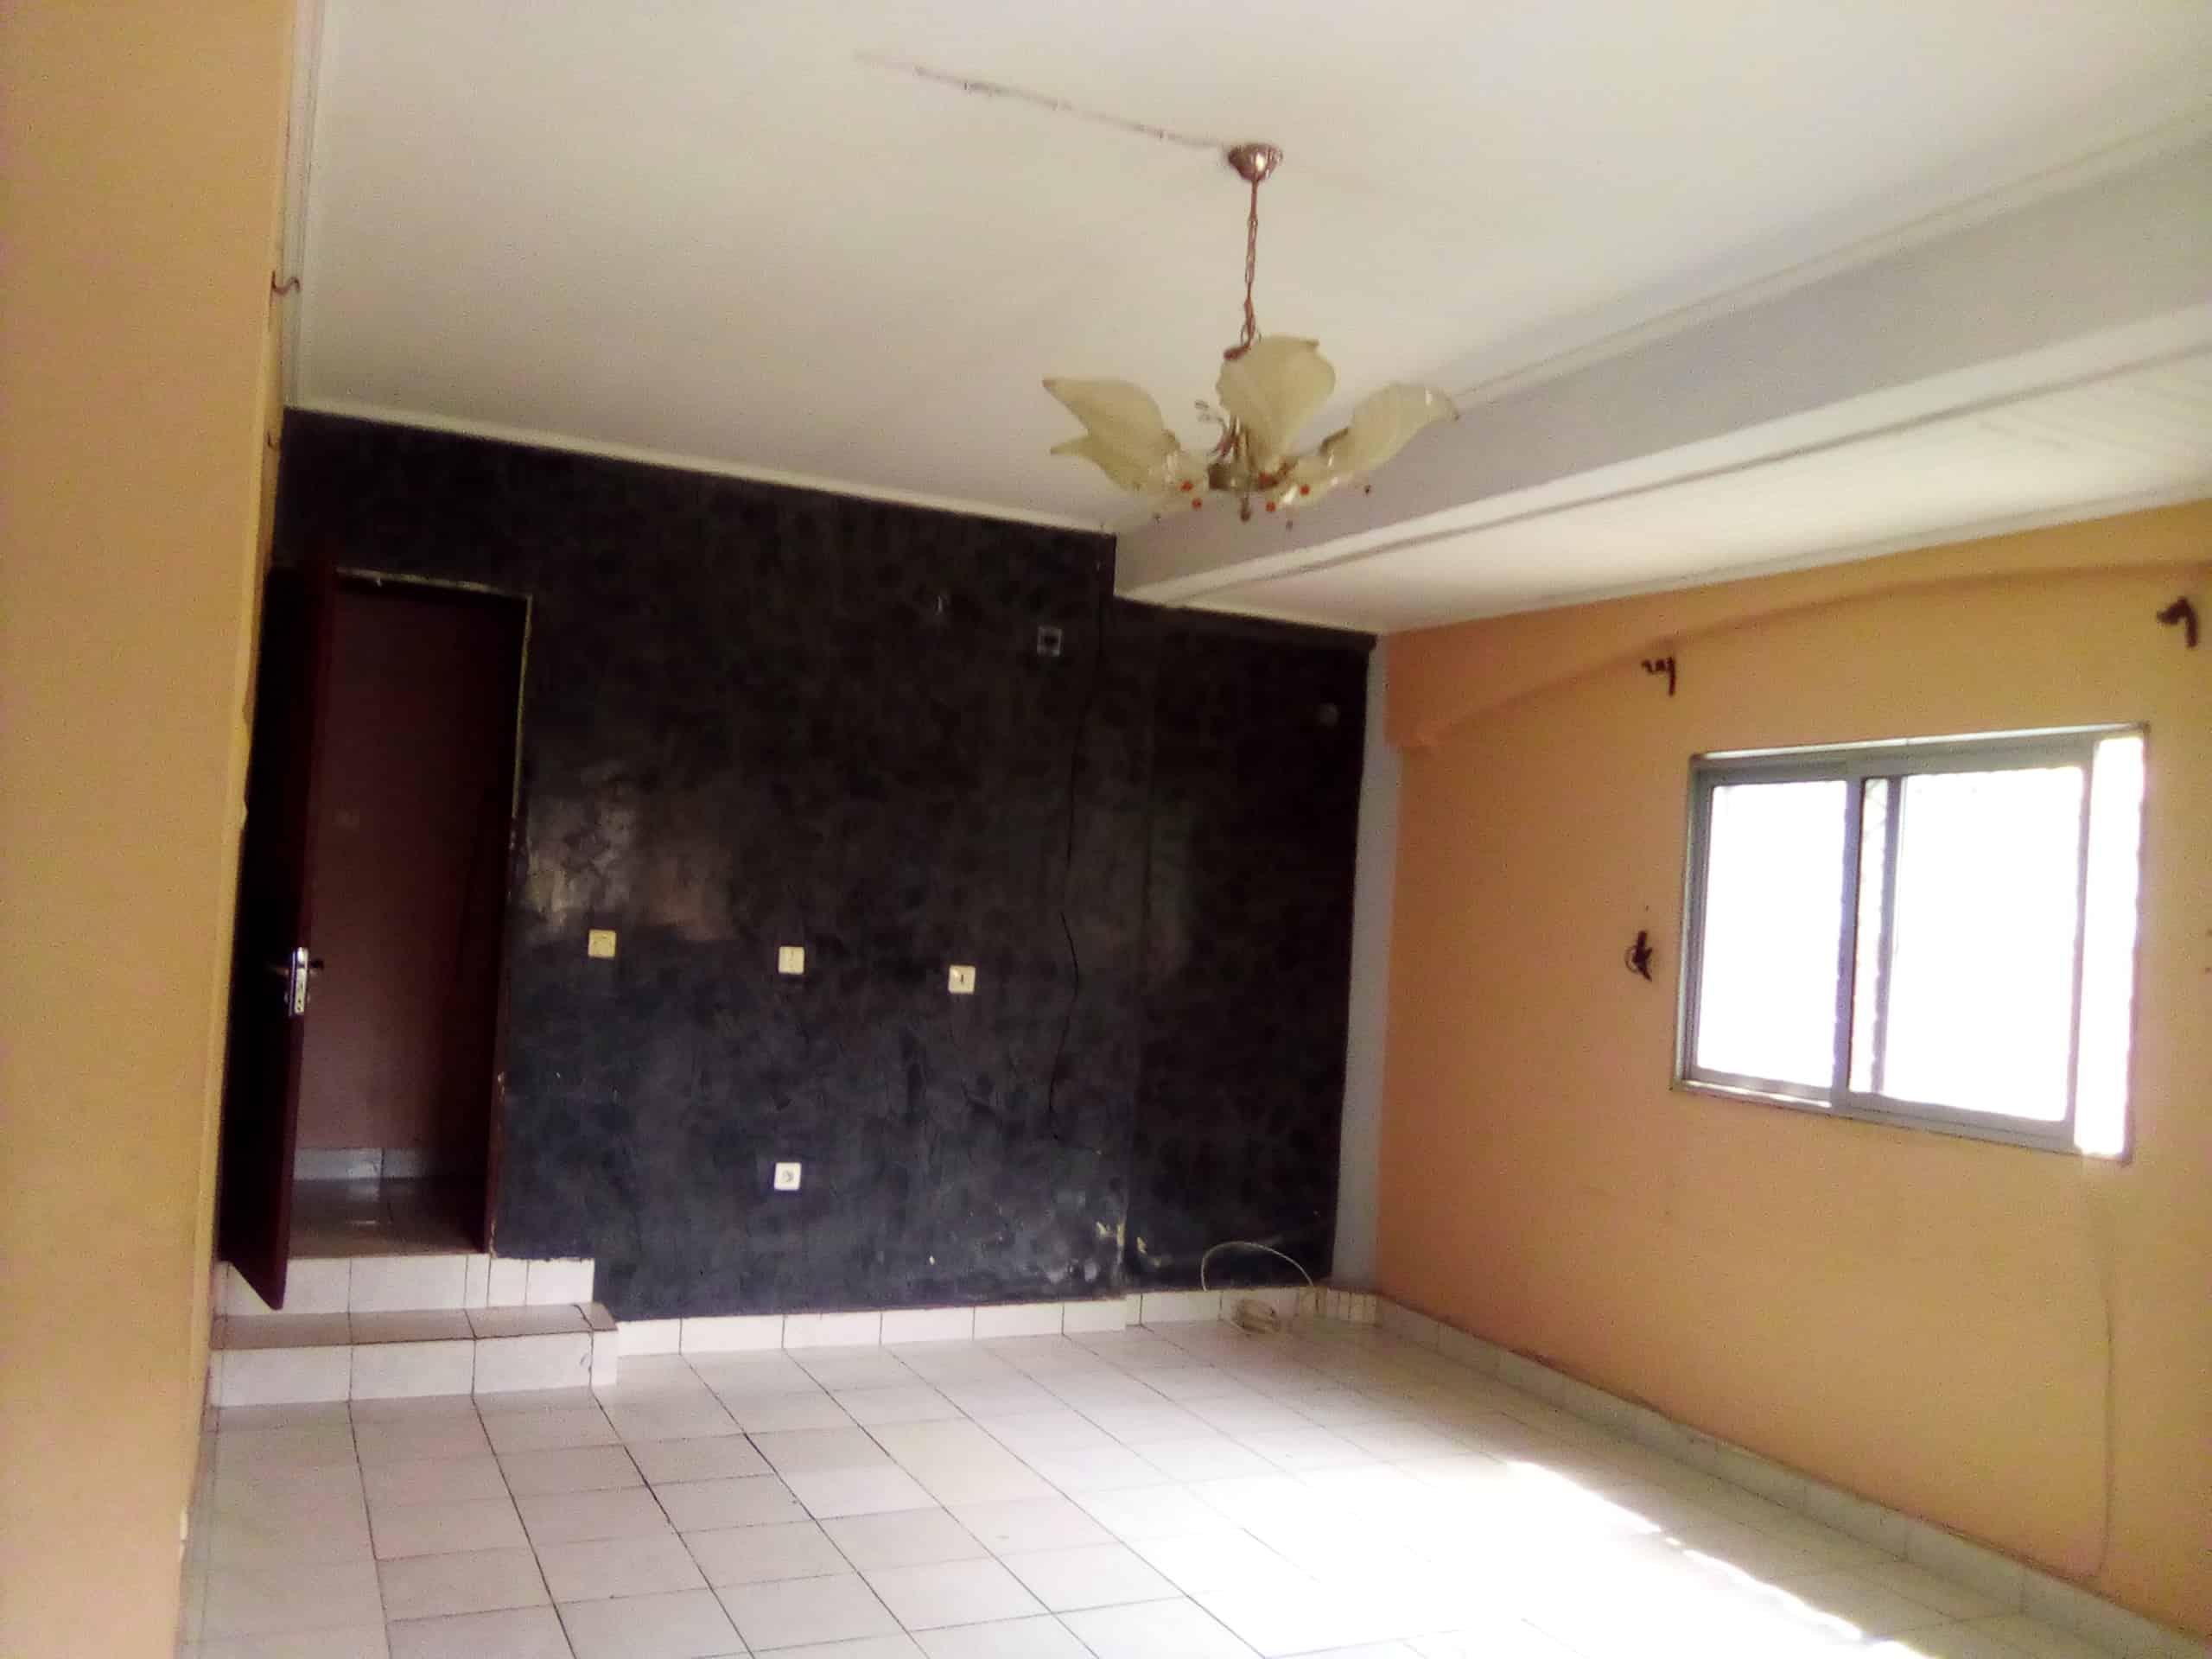 House (Villa) to rent - Douala, Makepe, BM - 1 living room(s), 3 bedroom(s), 2 bathroom(s) - 150 000 FCFA / month